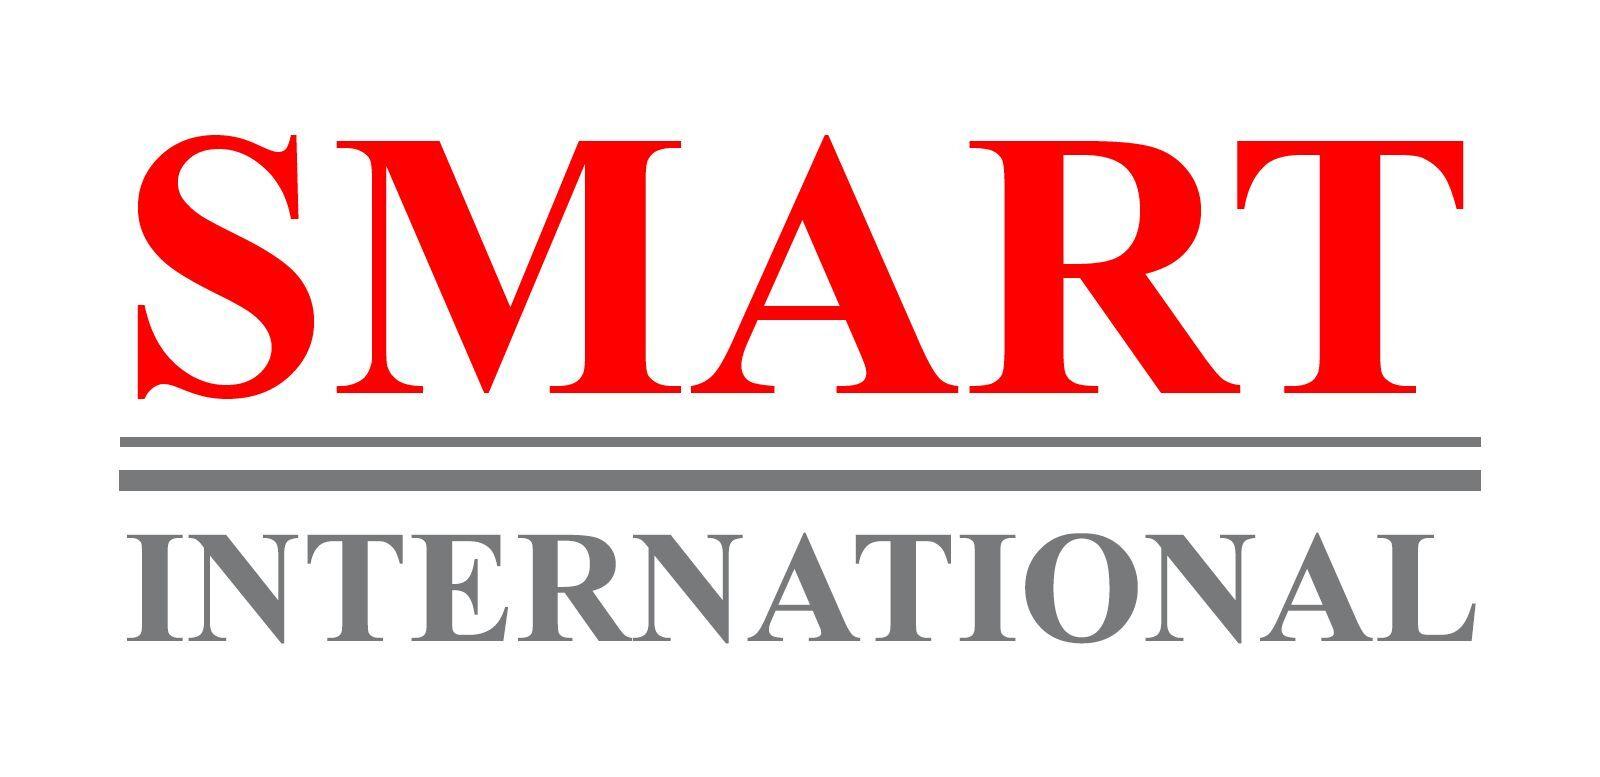 SMART INTERNATIONAL